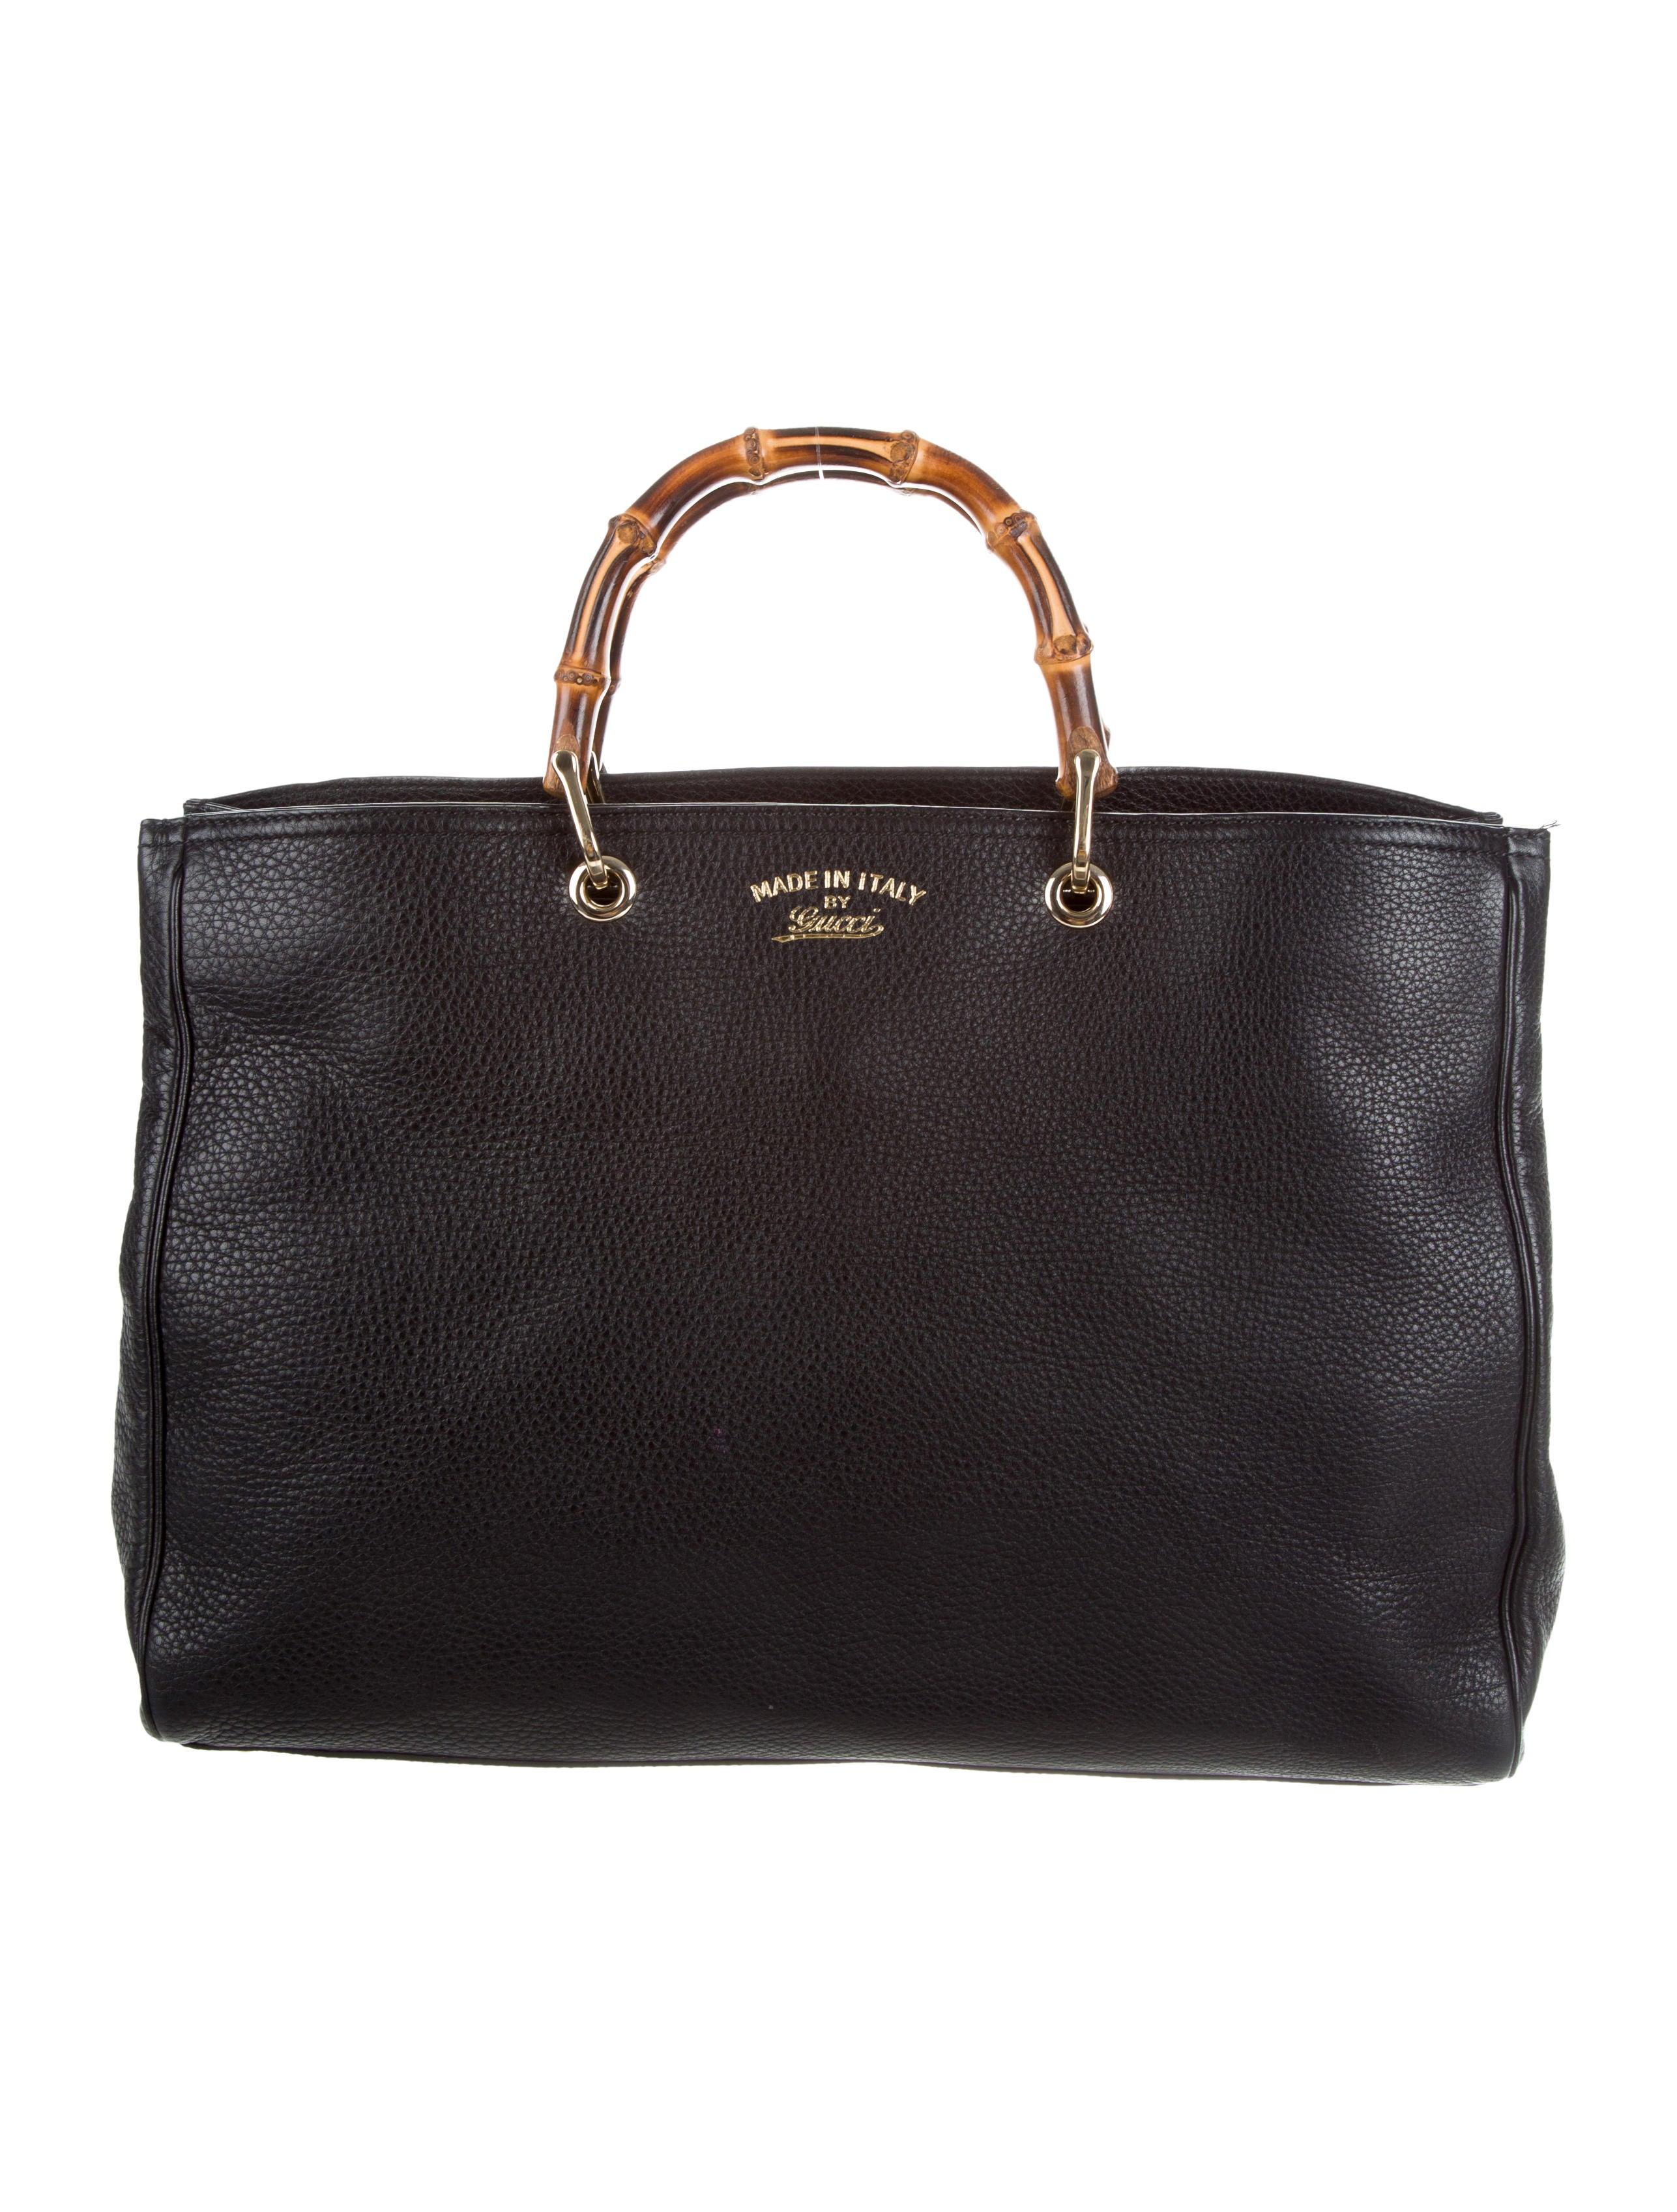 gucci large bamboo shopper tote handbags guc163551 the realreal. Black Bedroom Furniture Sets. Home Design Ideas